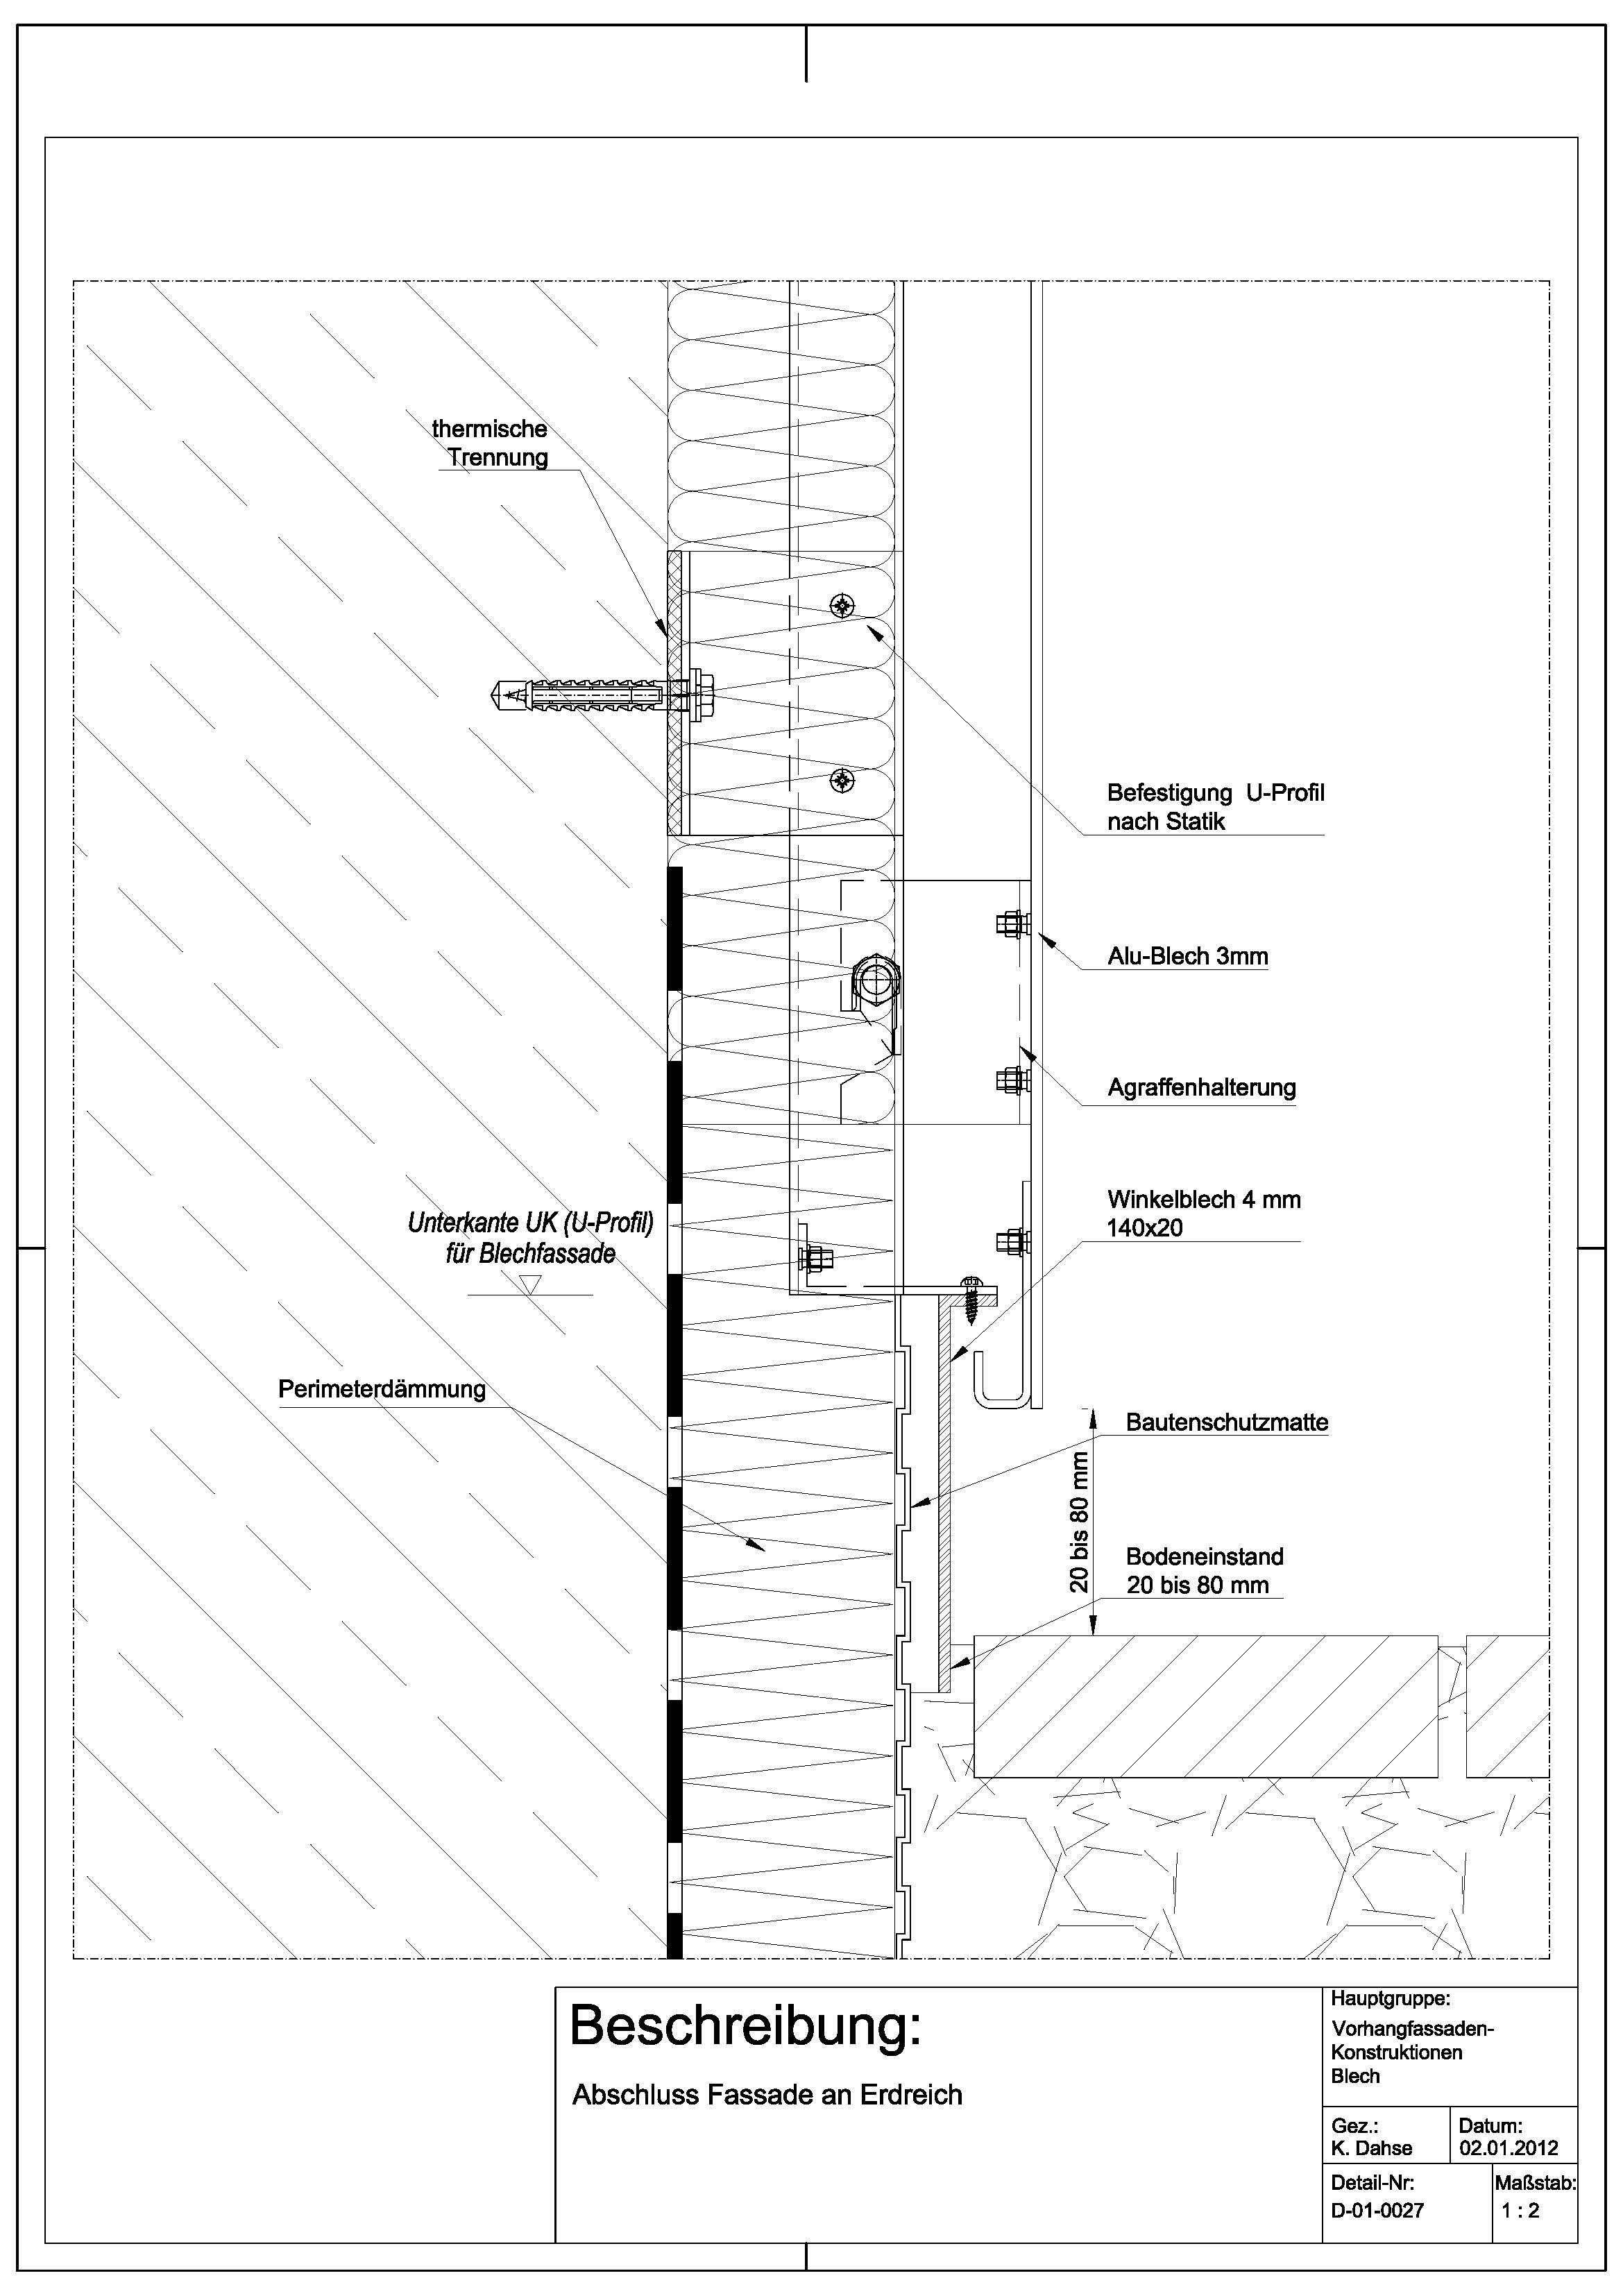 d 01 0027 abschluss fassade an erdreich detail pinterest vorhangfassade rohbau and. Black Bedroom Furniture Sets. Home Design Ideas